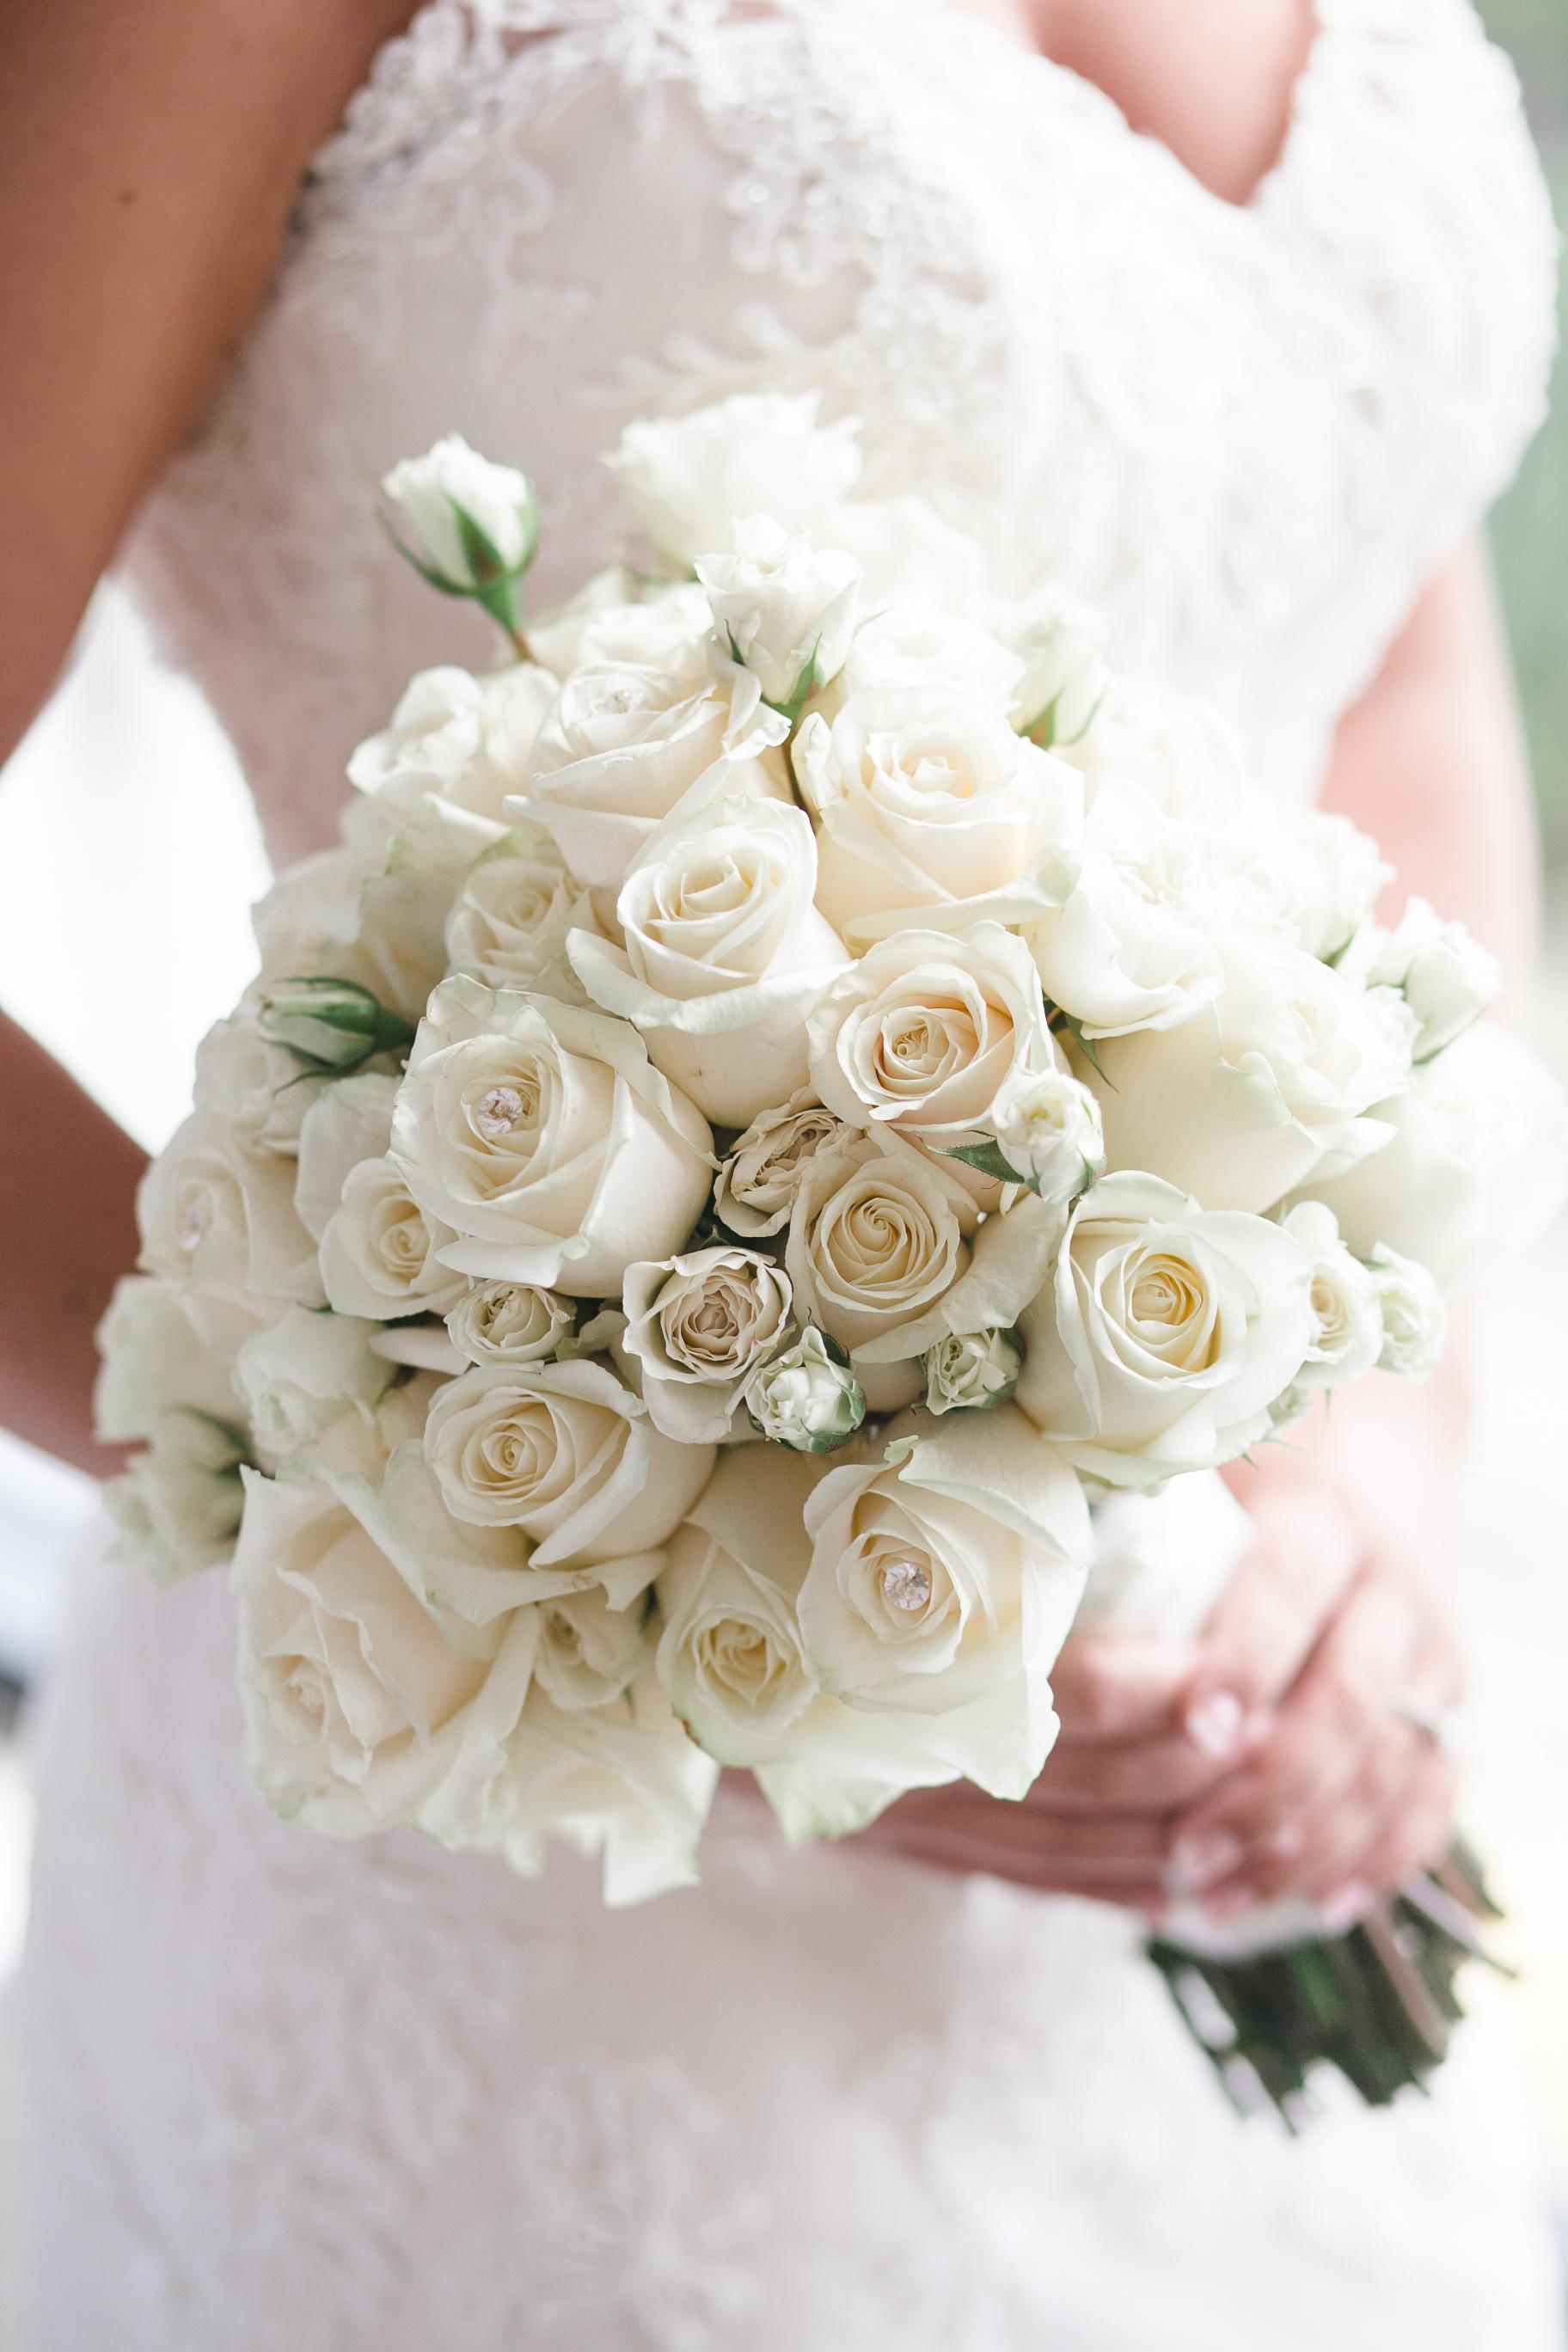 Harris wedding (57 of 72).JPG